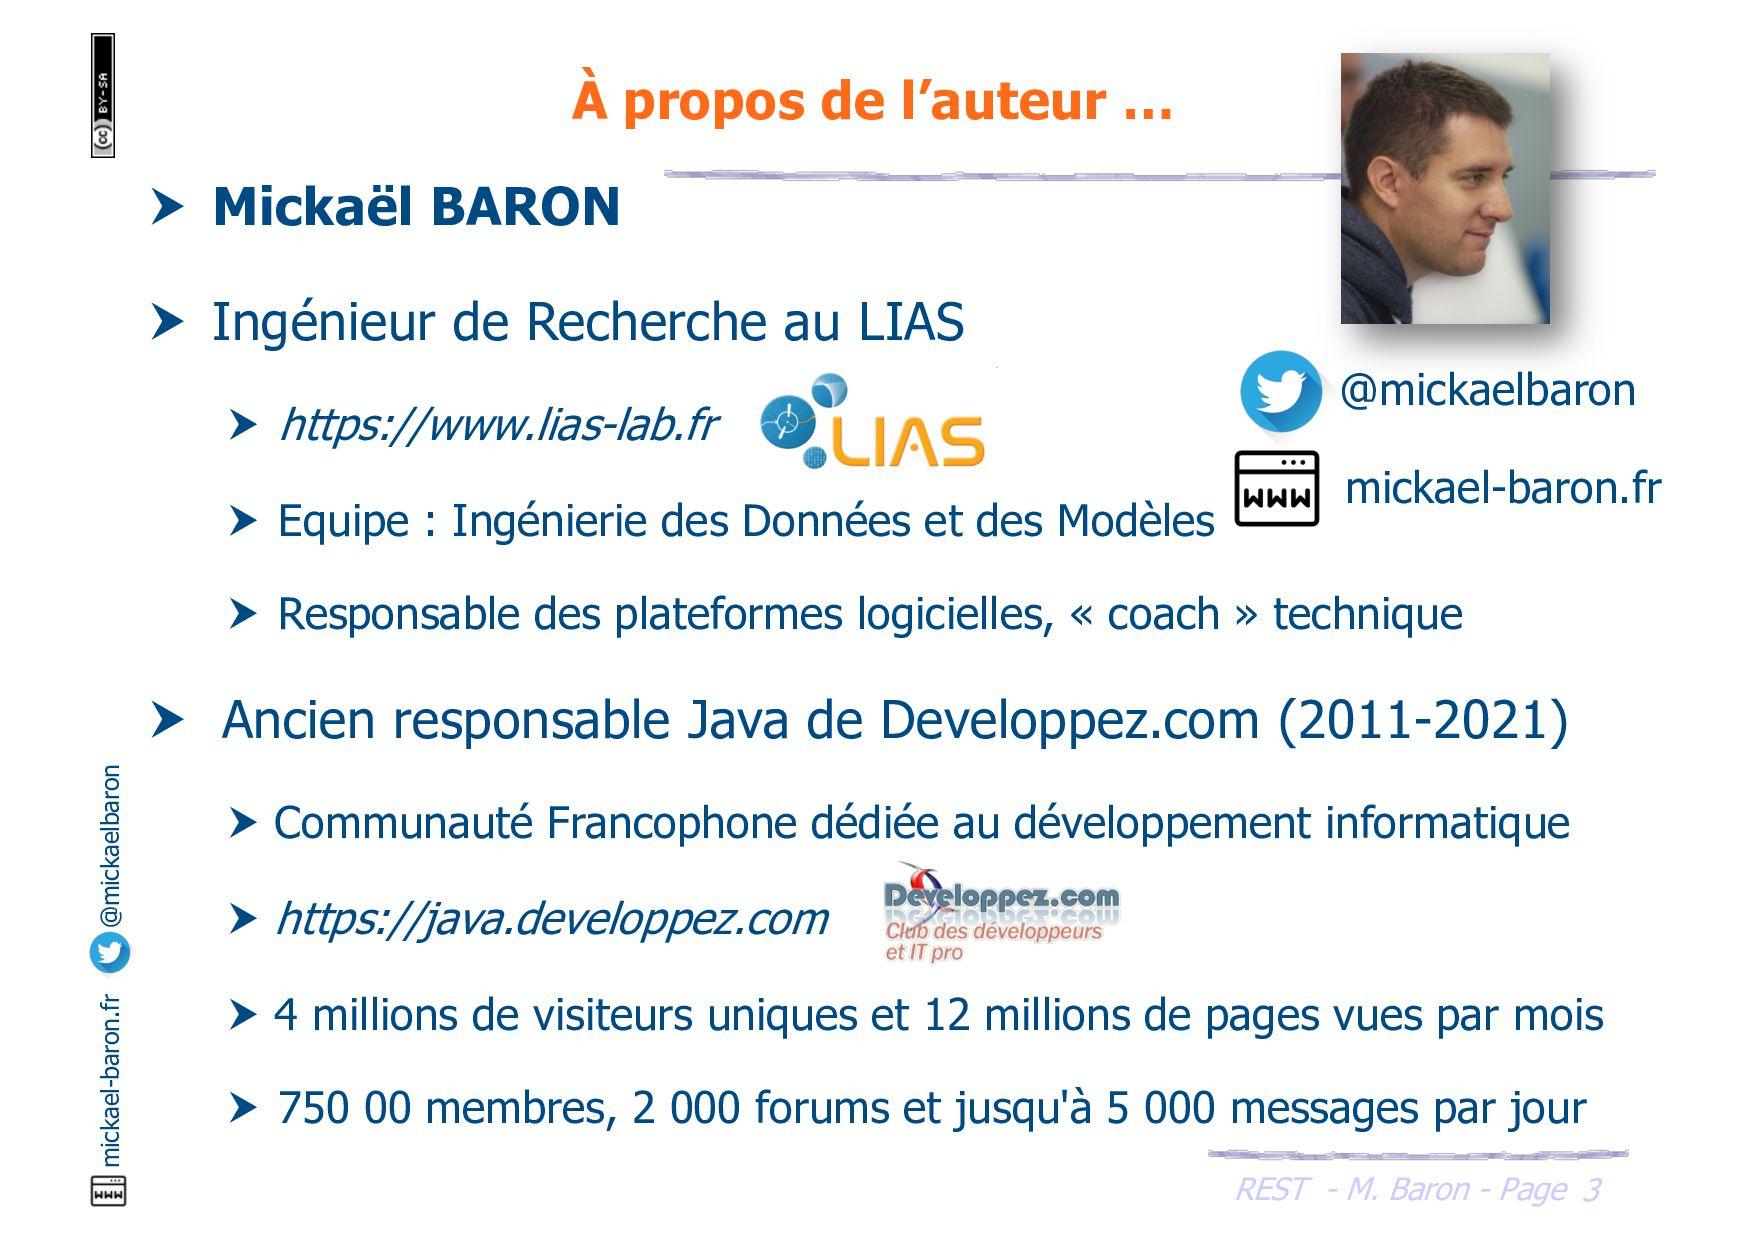 REST - M. Baron - Page mickael-baron.fr @mickae...